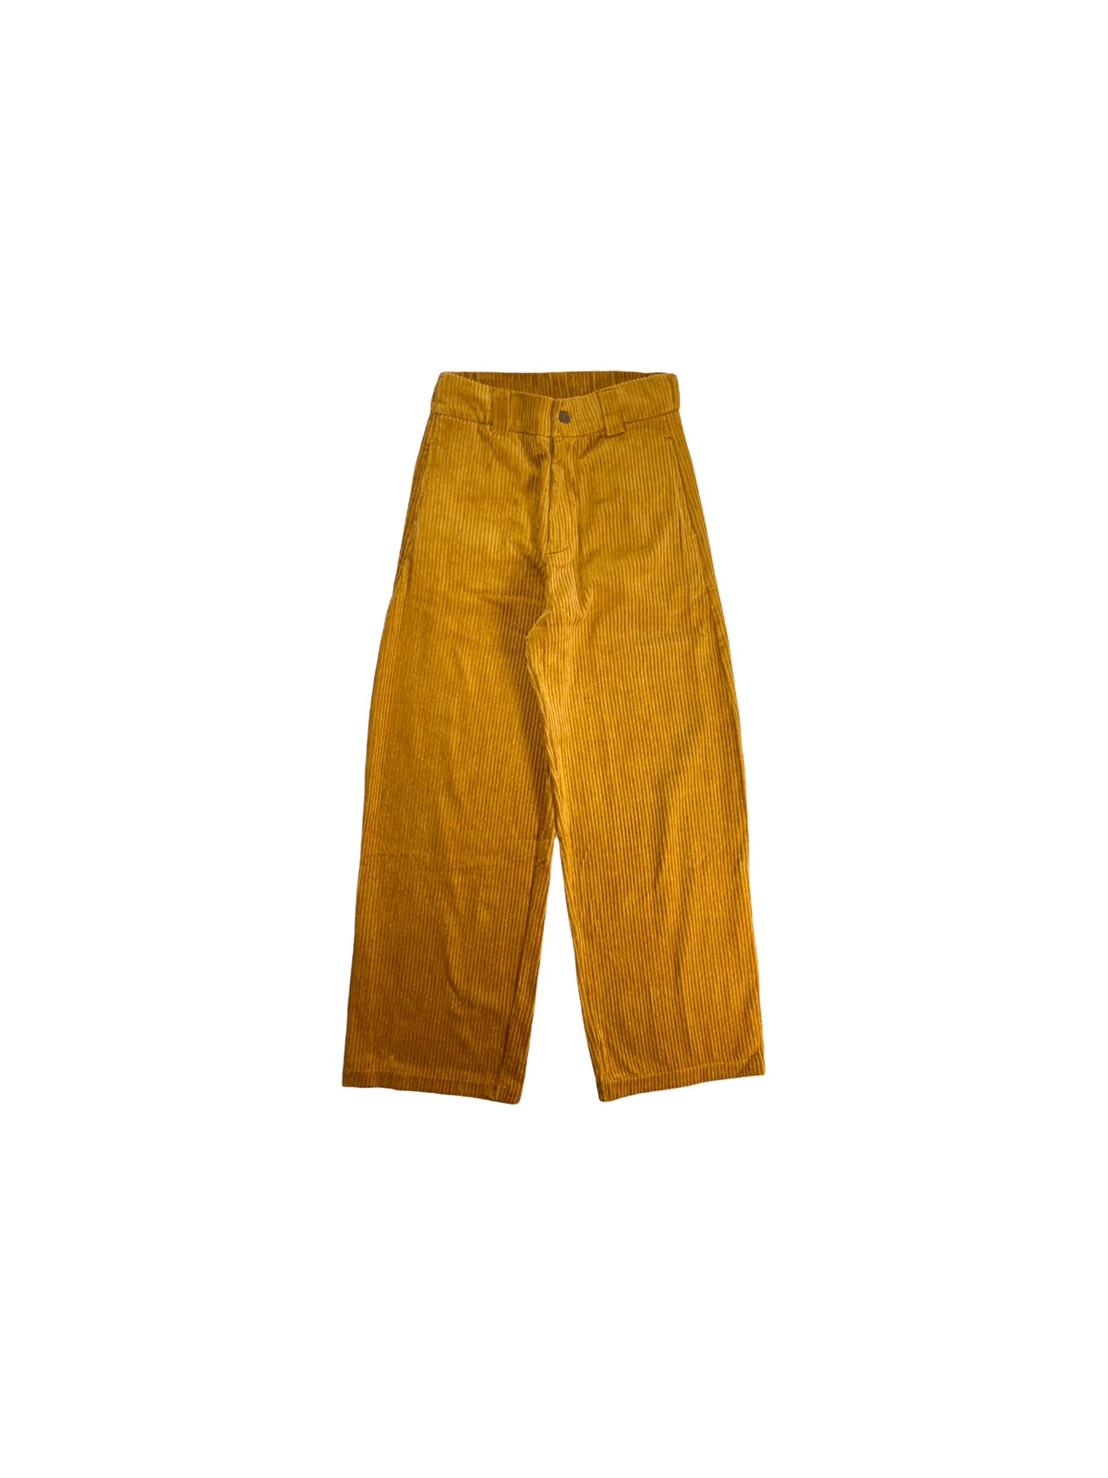 Ronald's Corduroy Pants (Mustard)